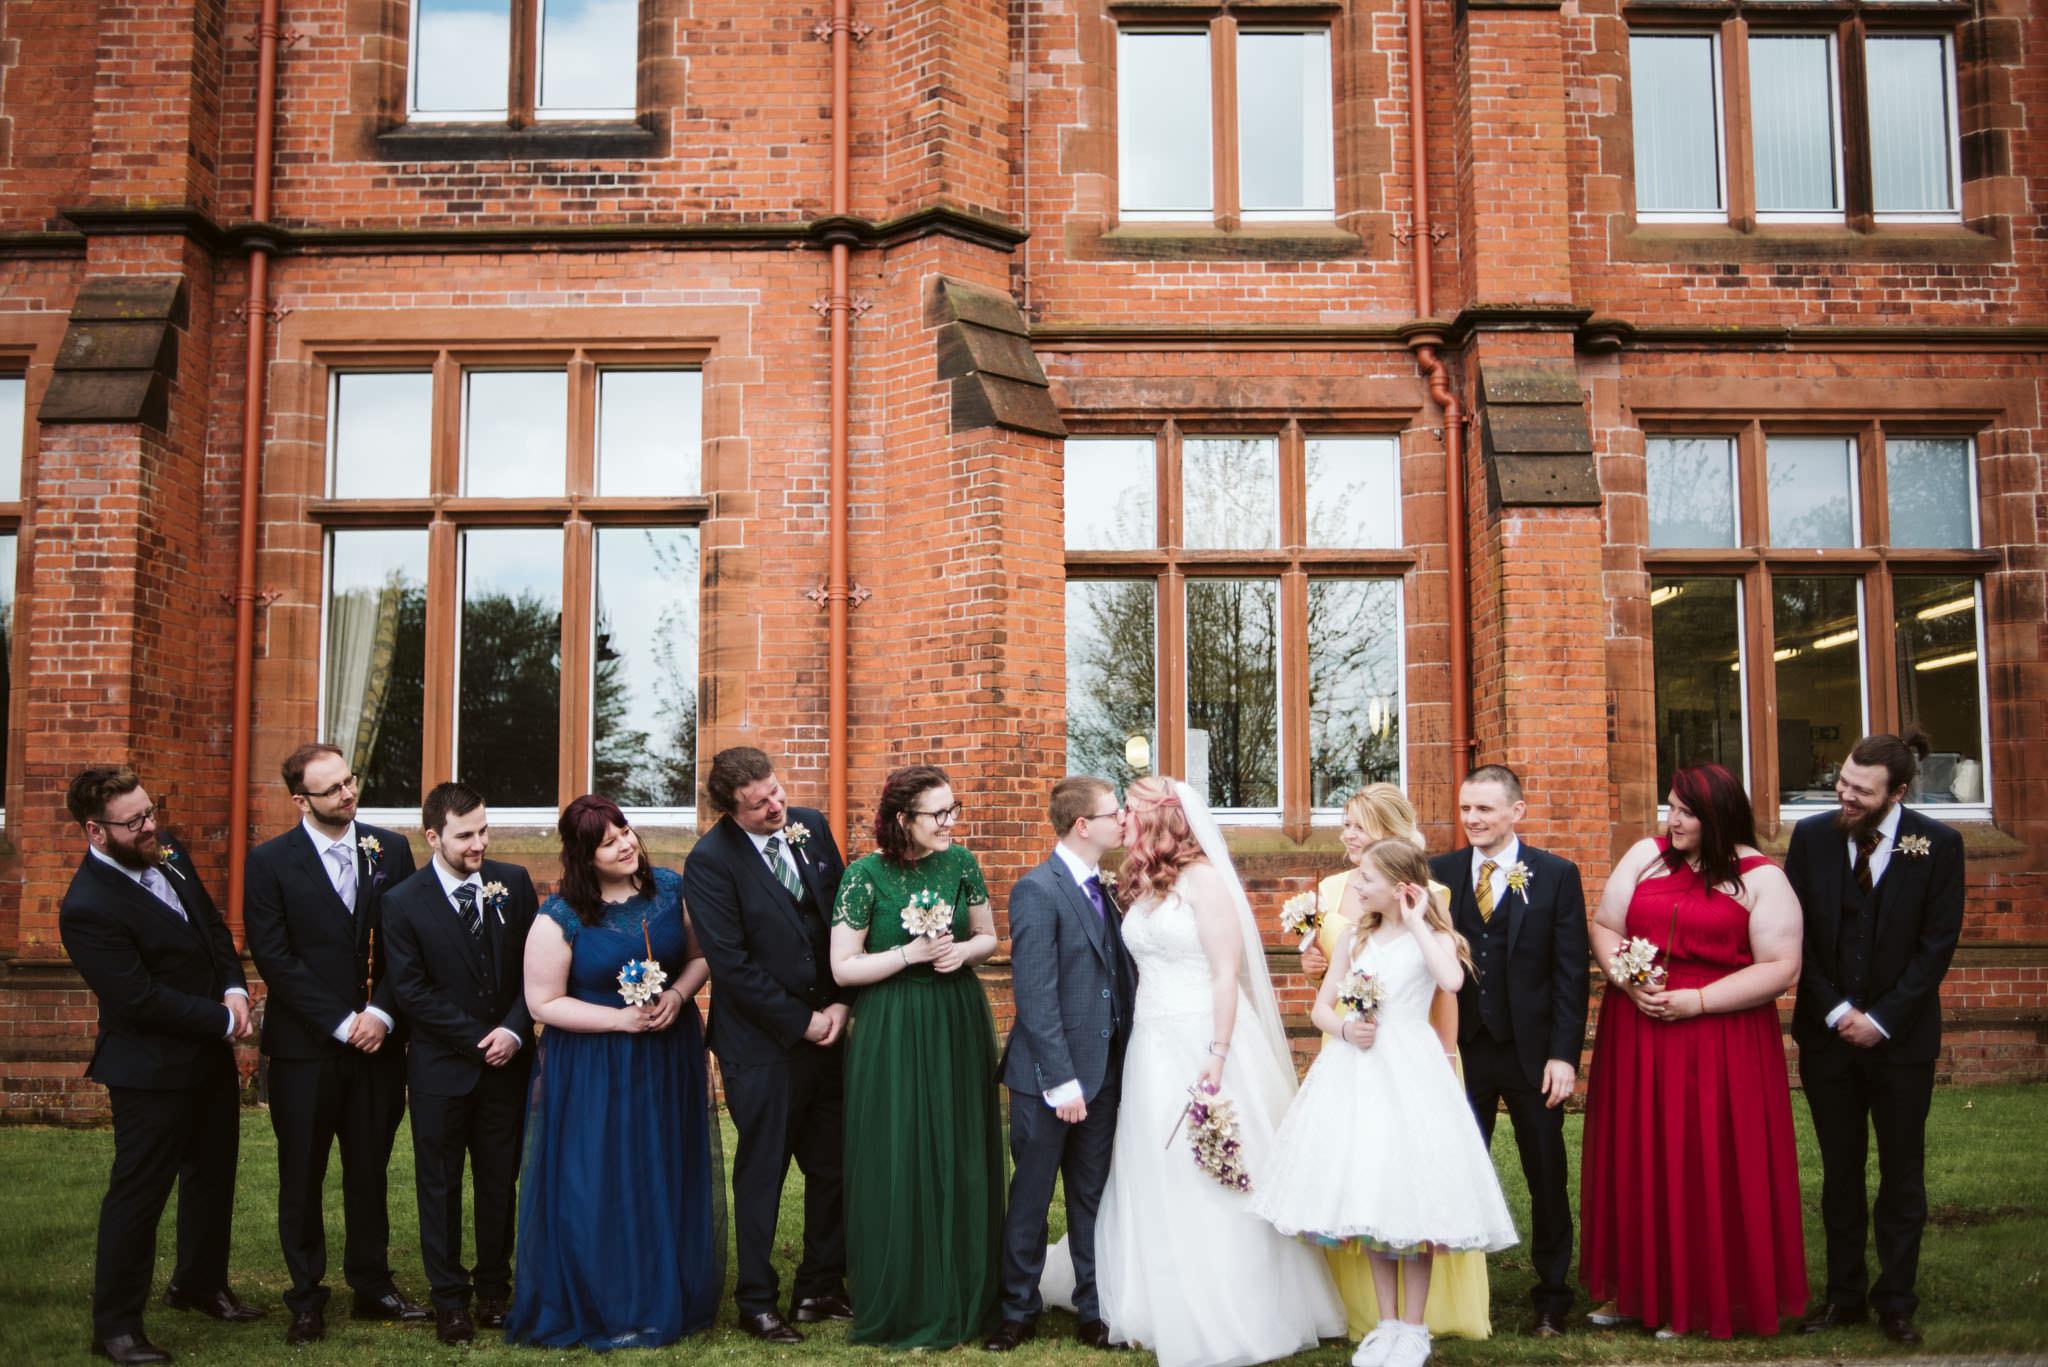 Harry Potter Themed Wedding, Riddel Hall, Great Hall, Hogwarts, Queens University Belfast, Northern Ireland